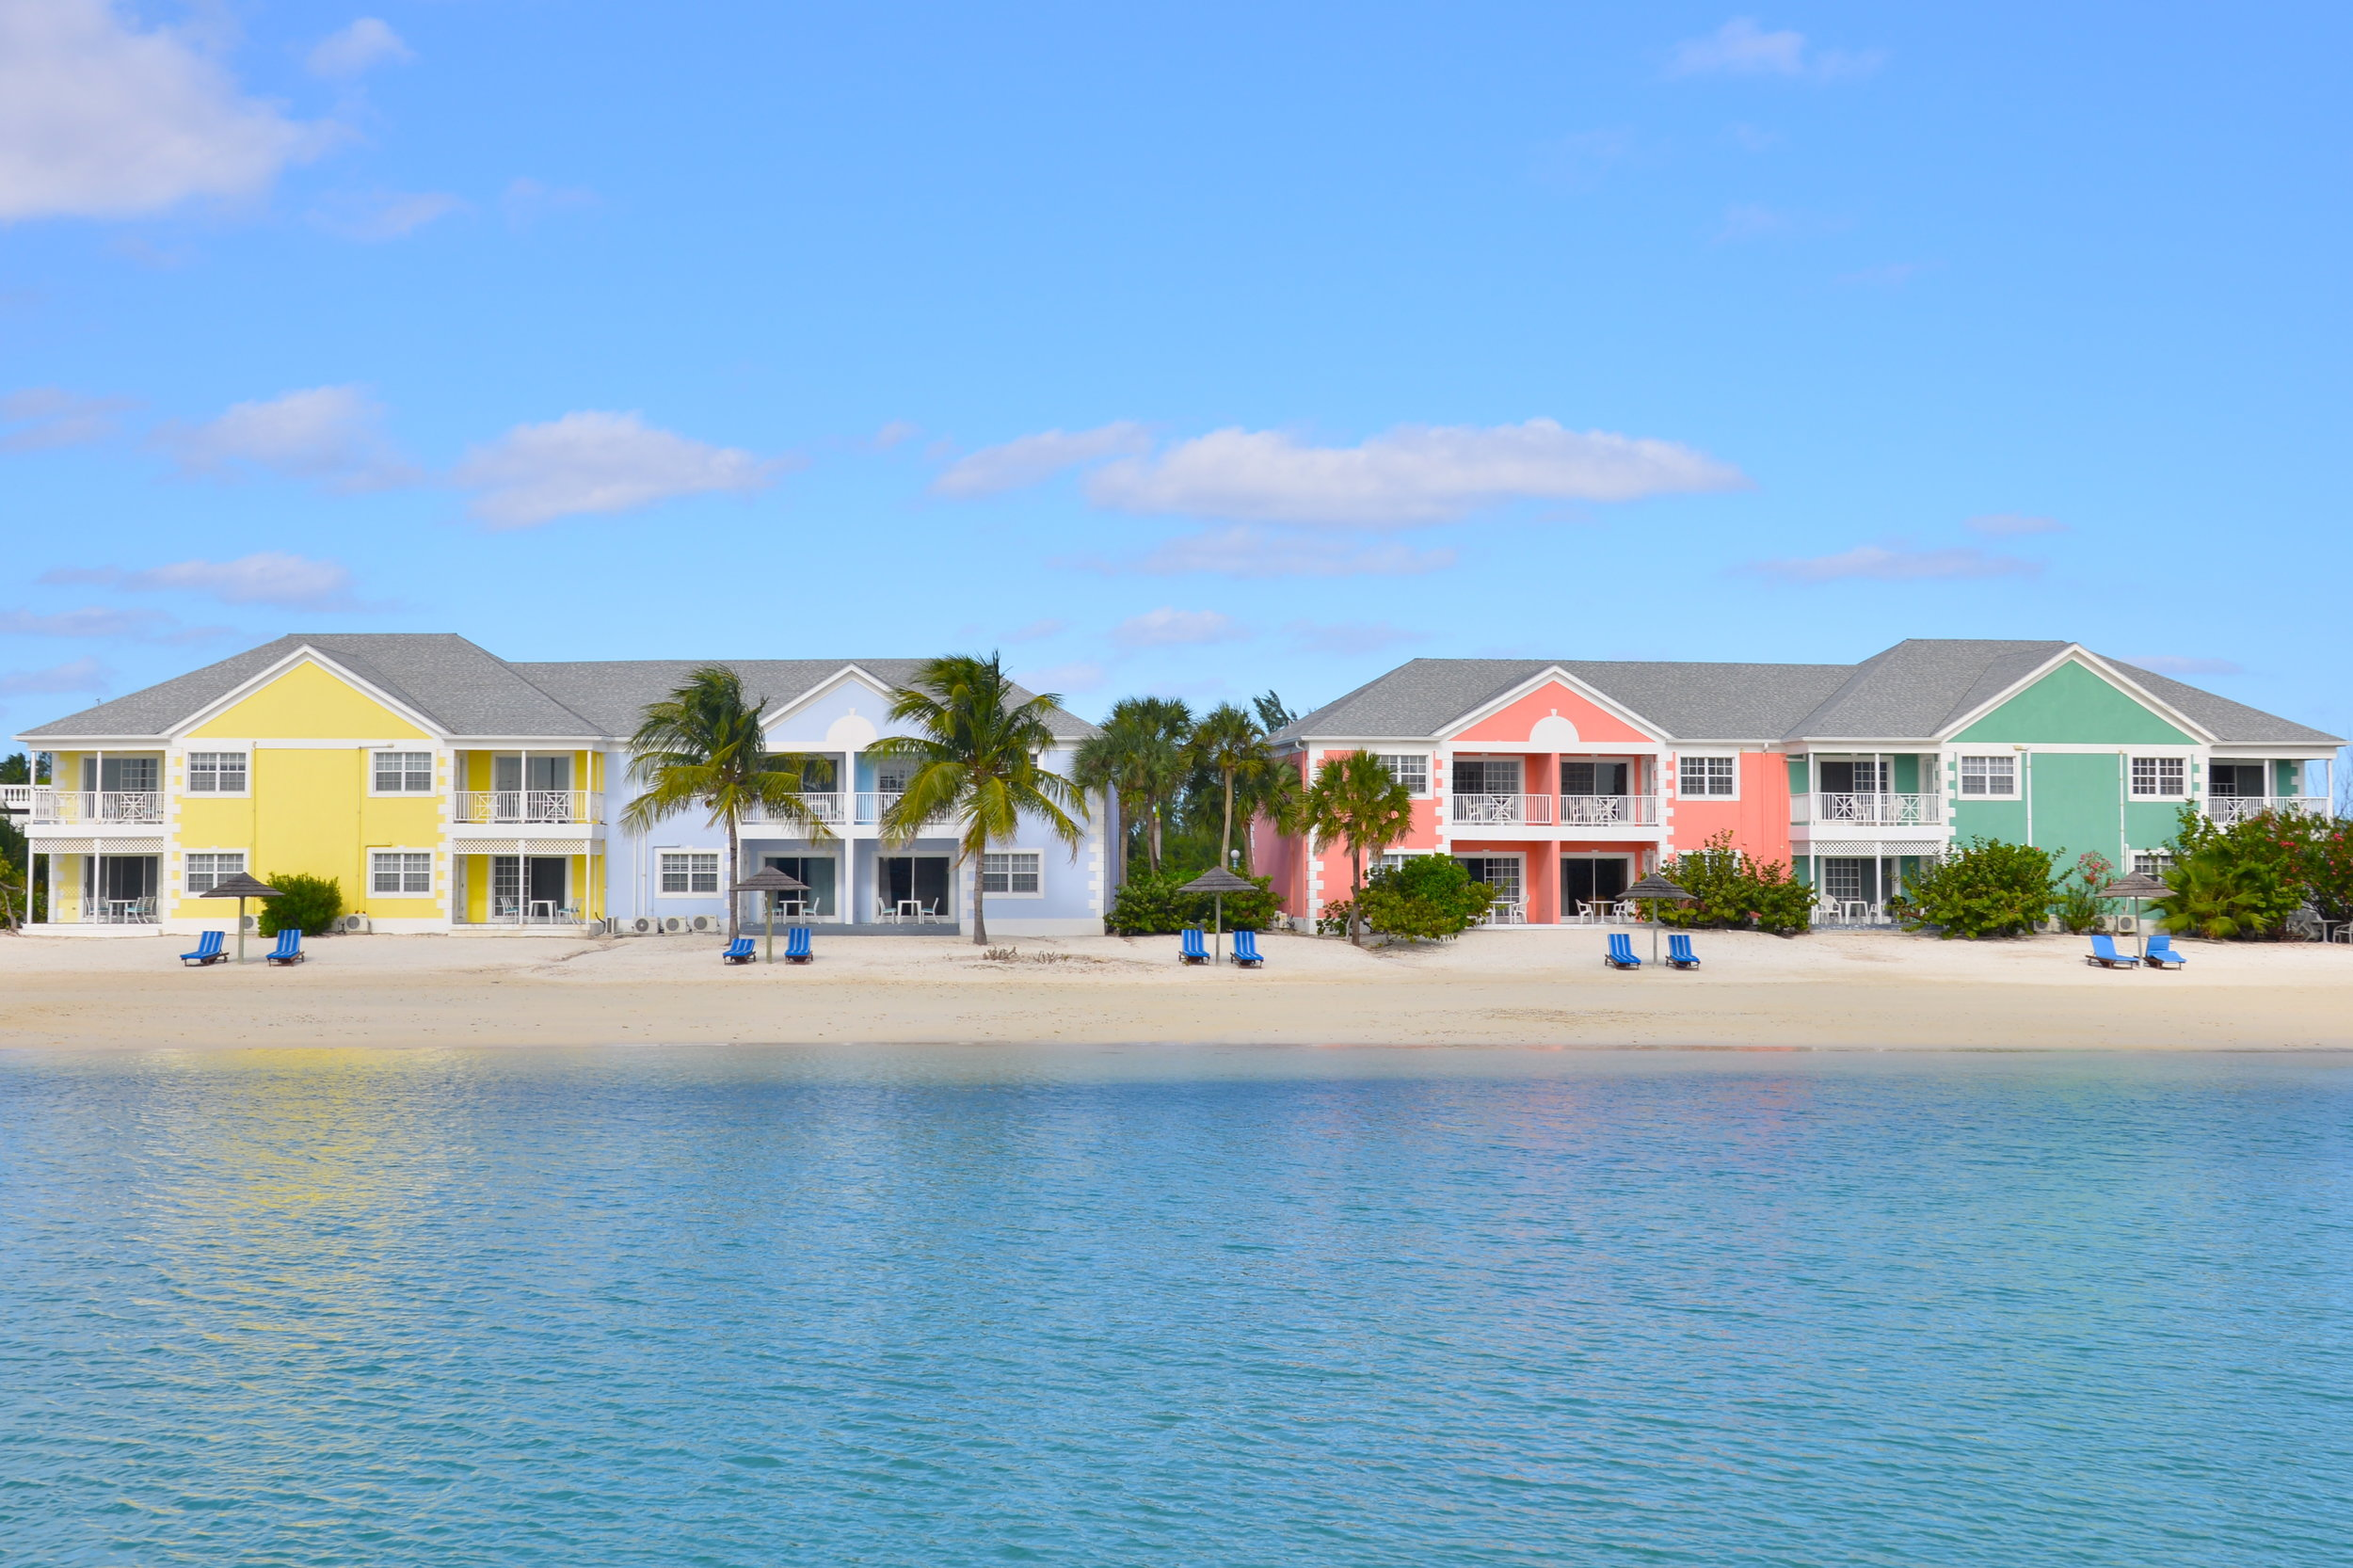 Sandyport Beach Resort Lagoon Beach.JPG